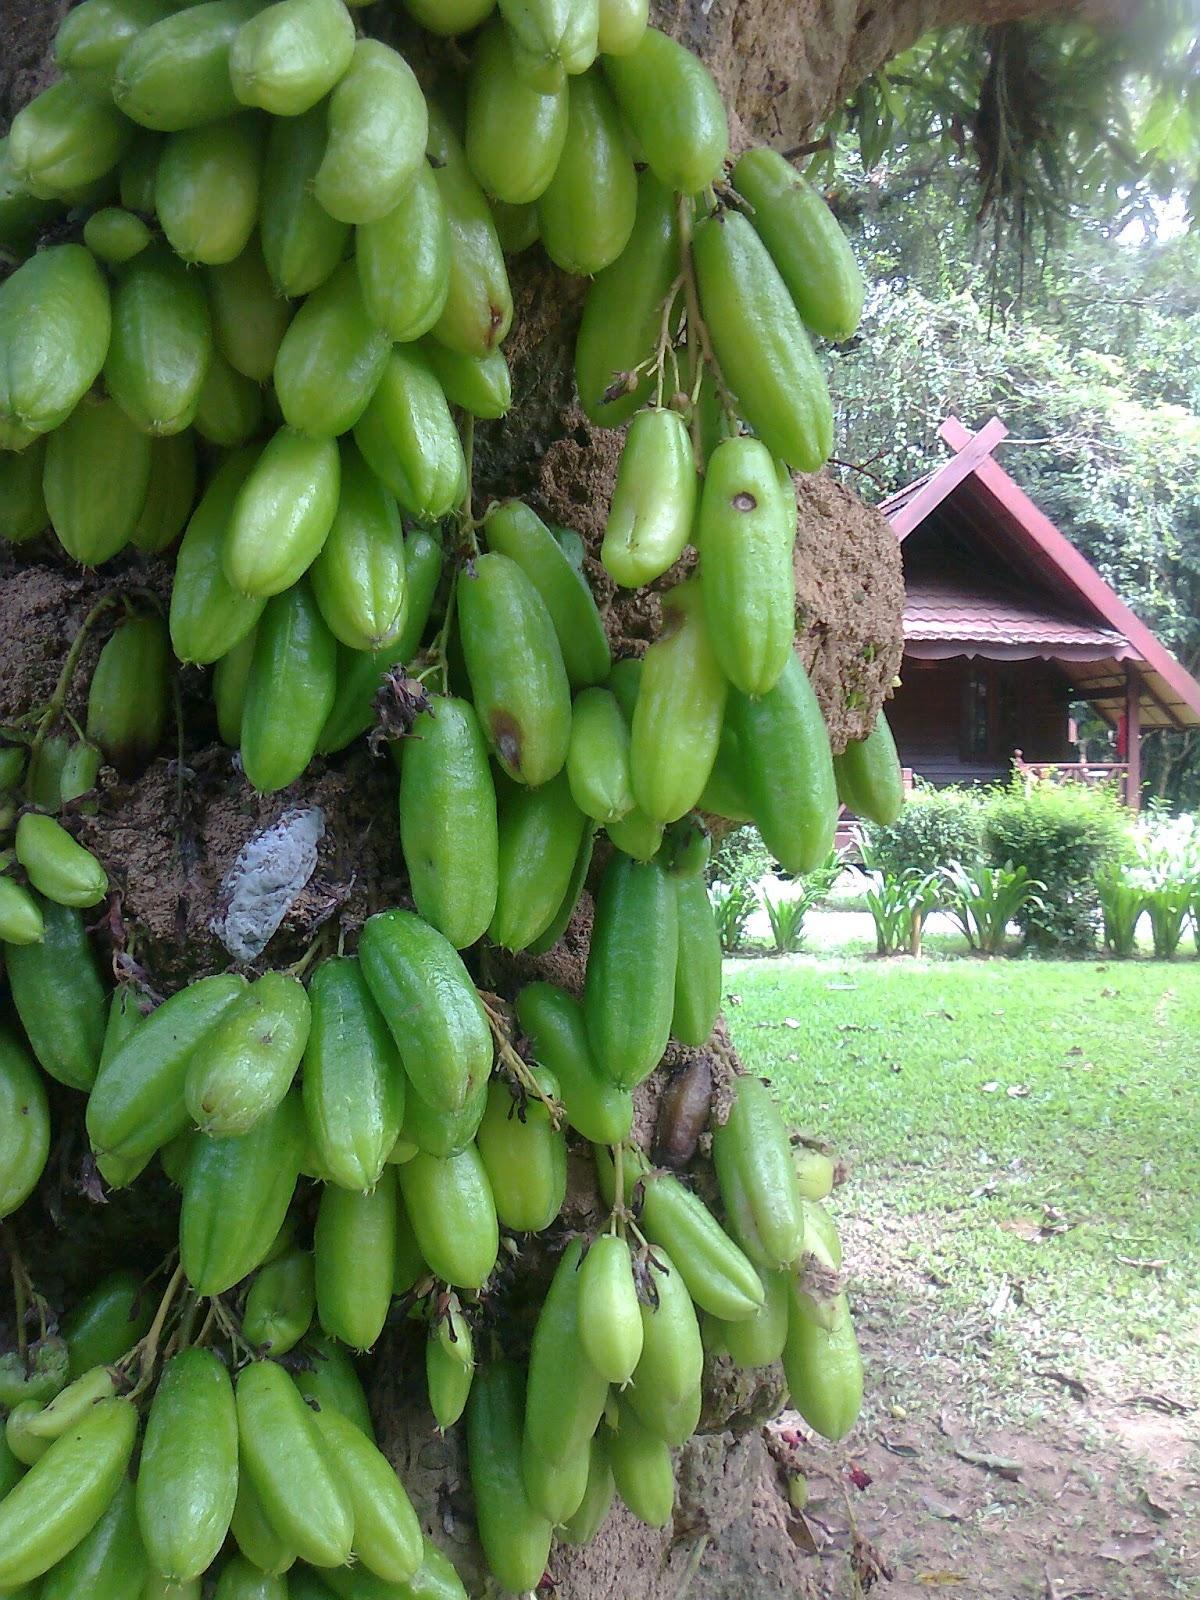 Berisi 55 butir biji benih bonsai buah belimbing wuluh